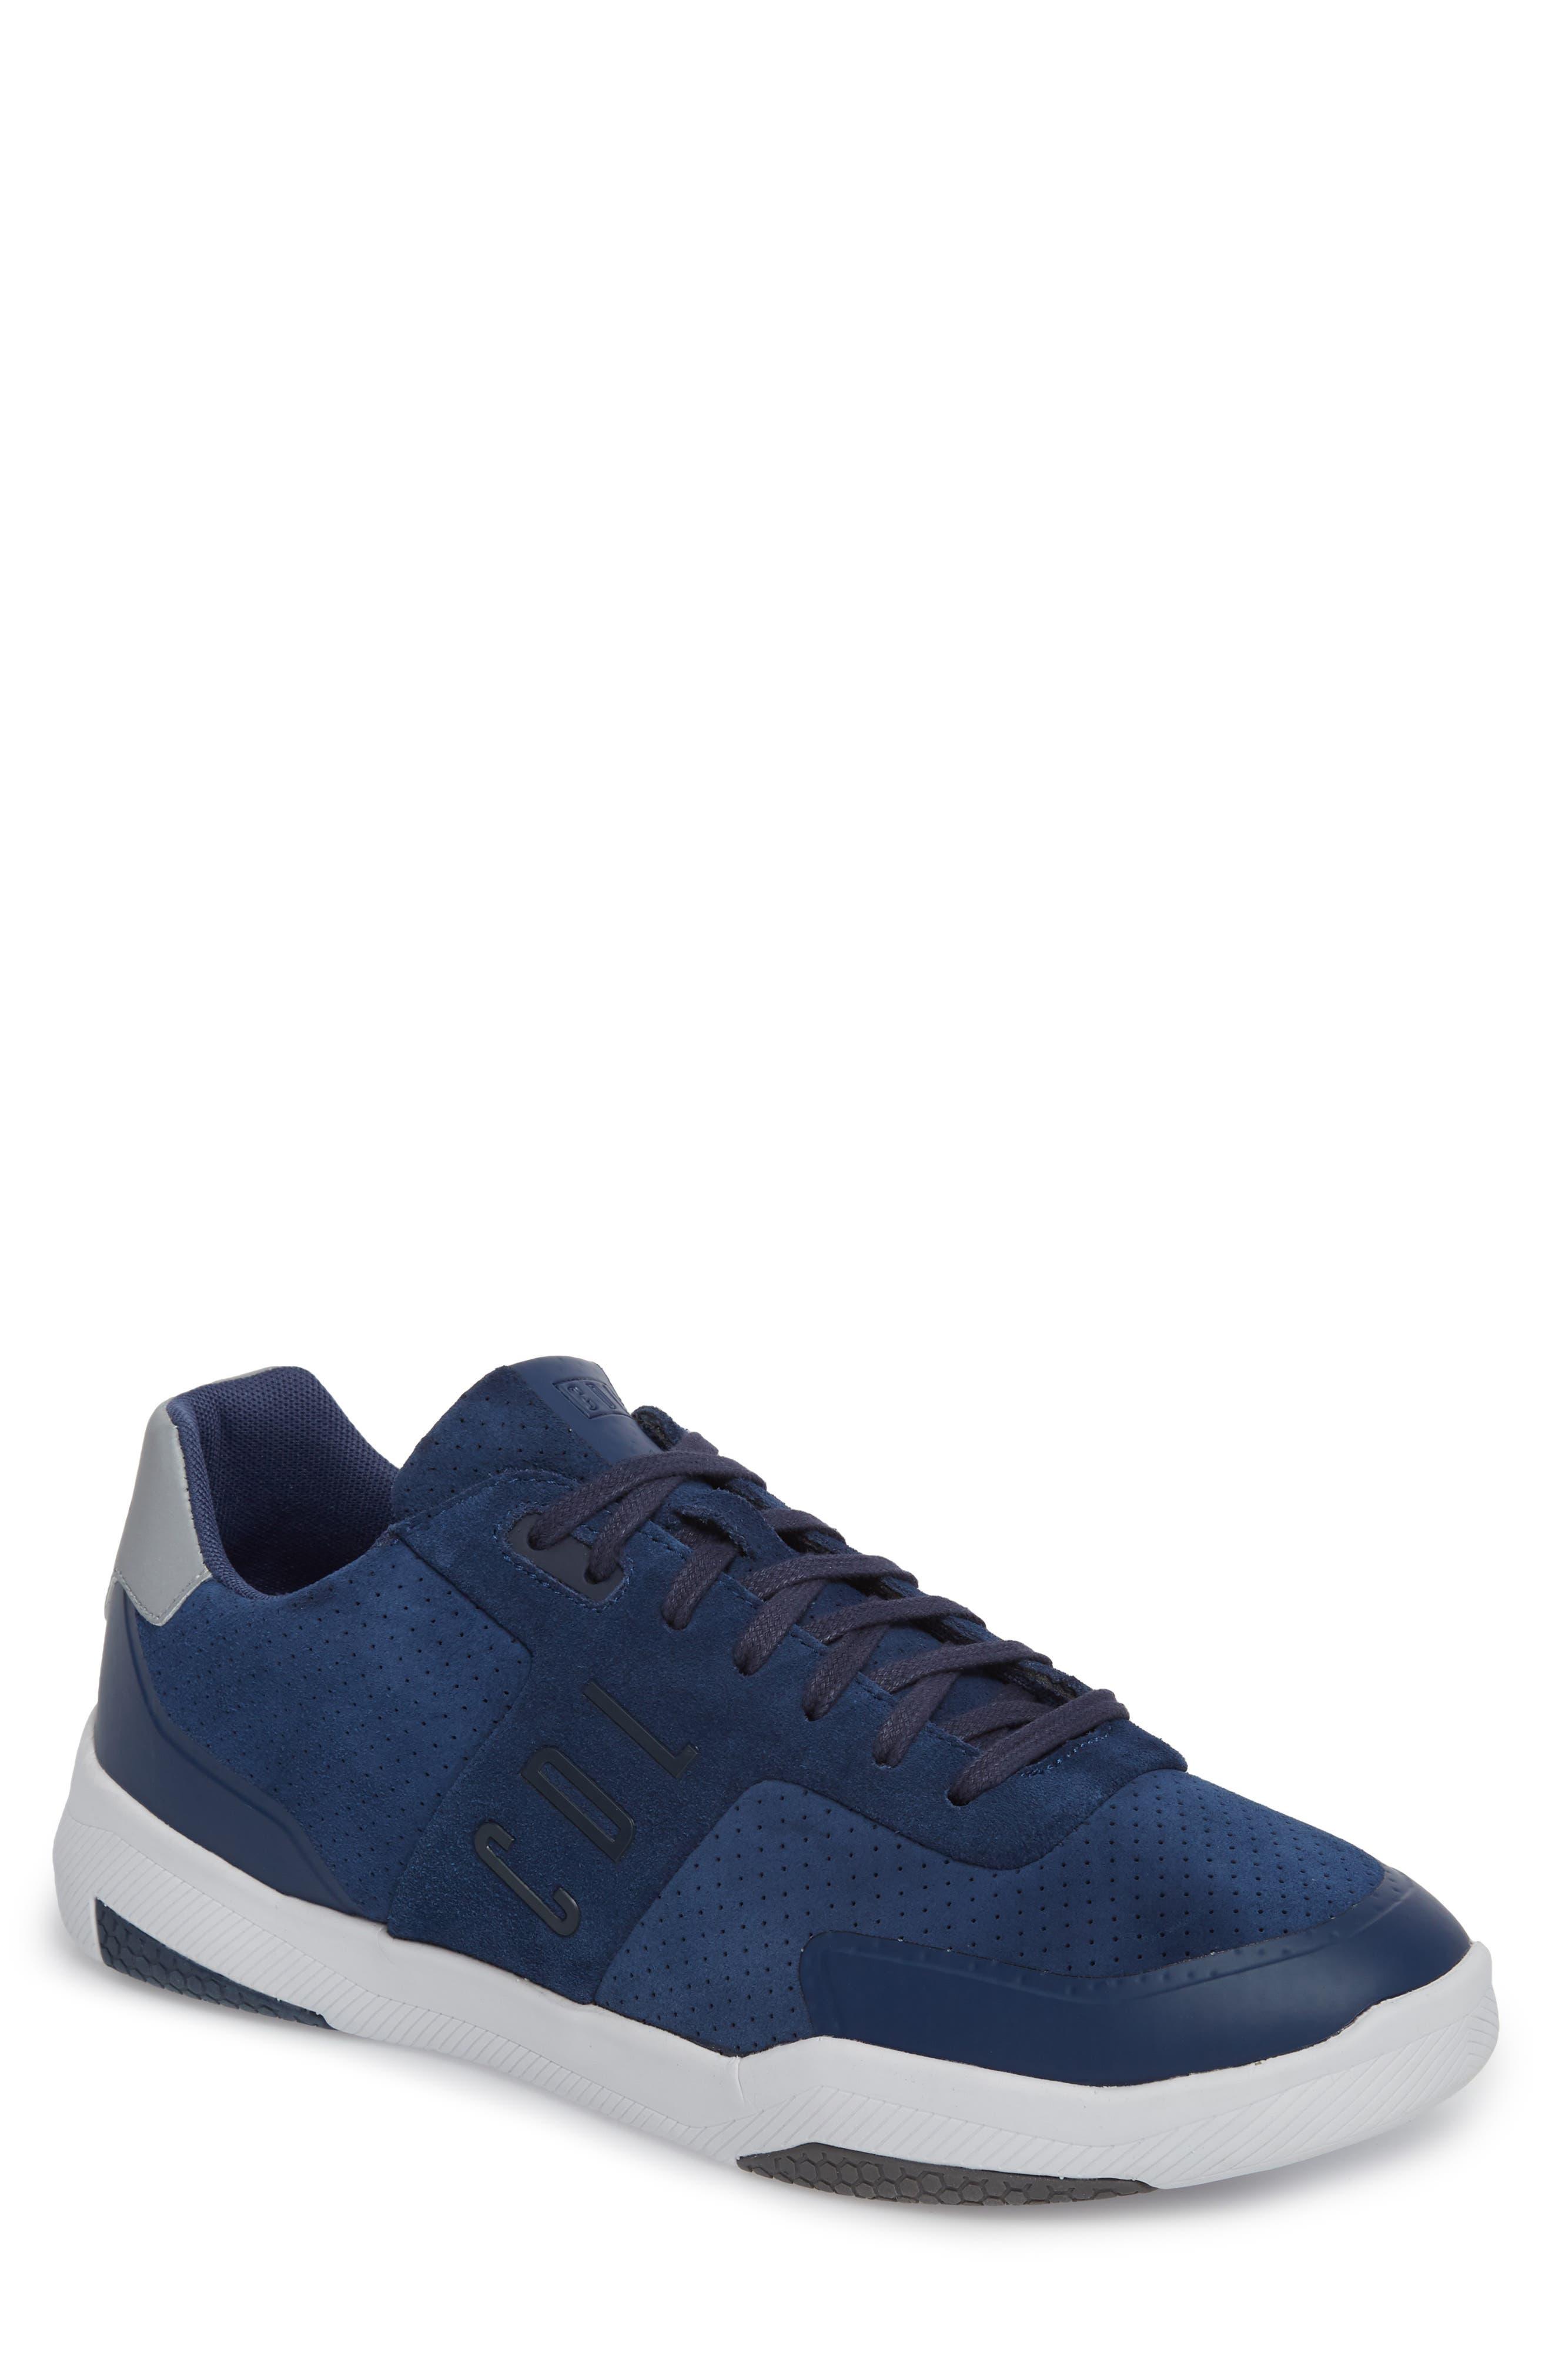 Shima Low Top Sneaker,                         Main,                         color, NAVY SUEDE